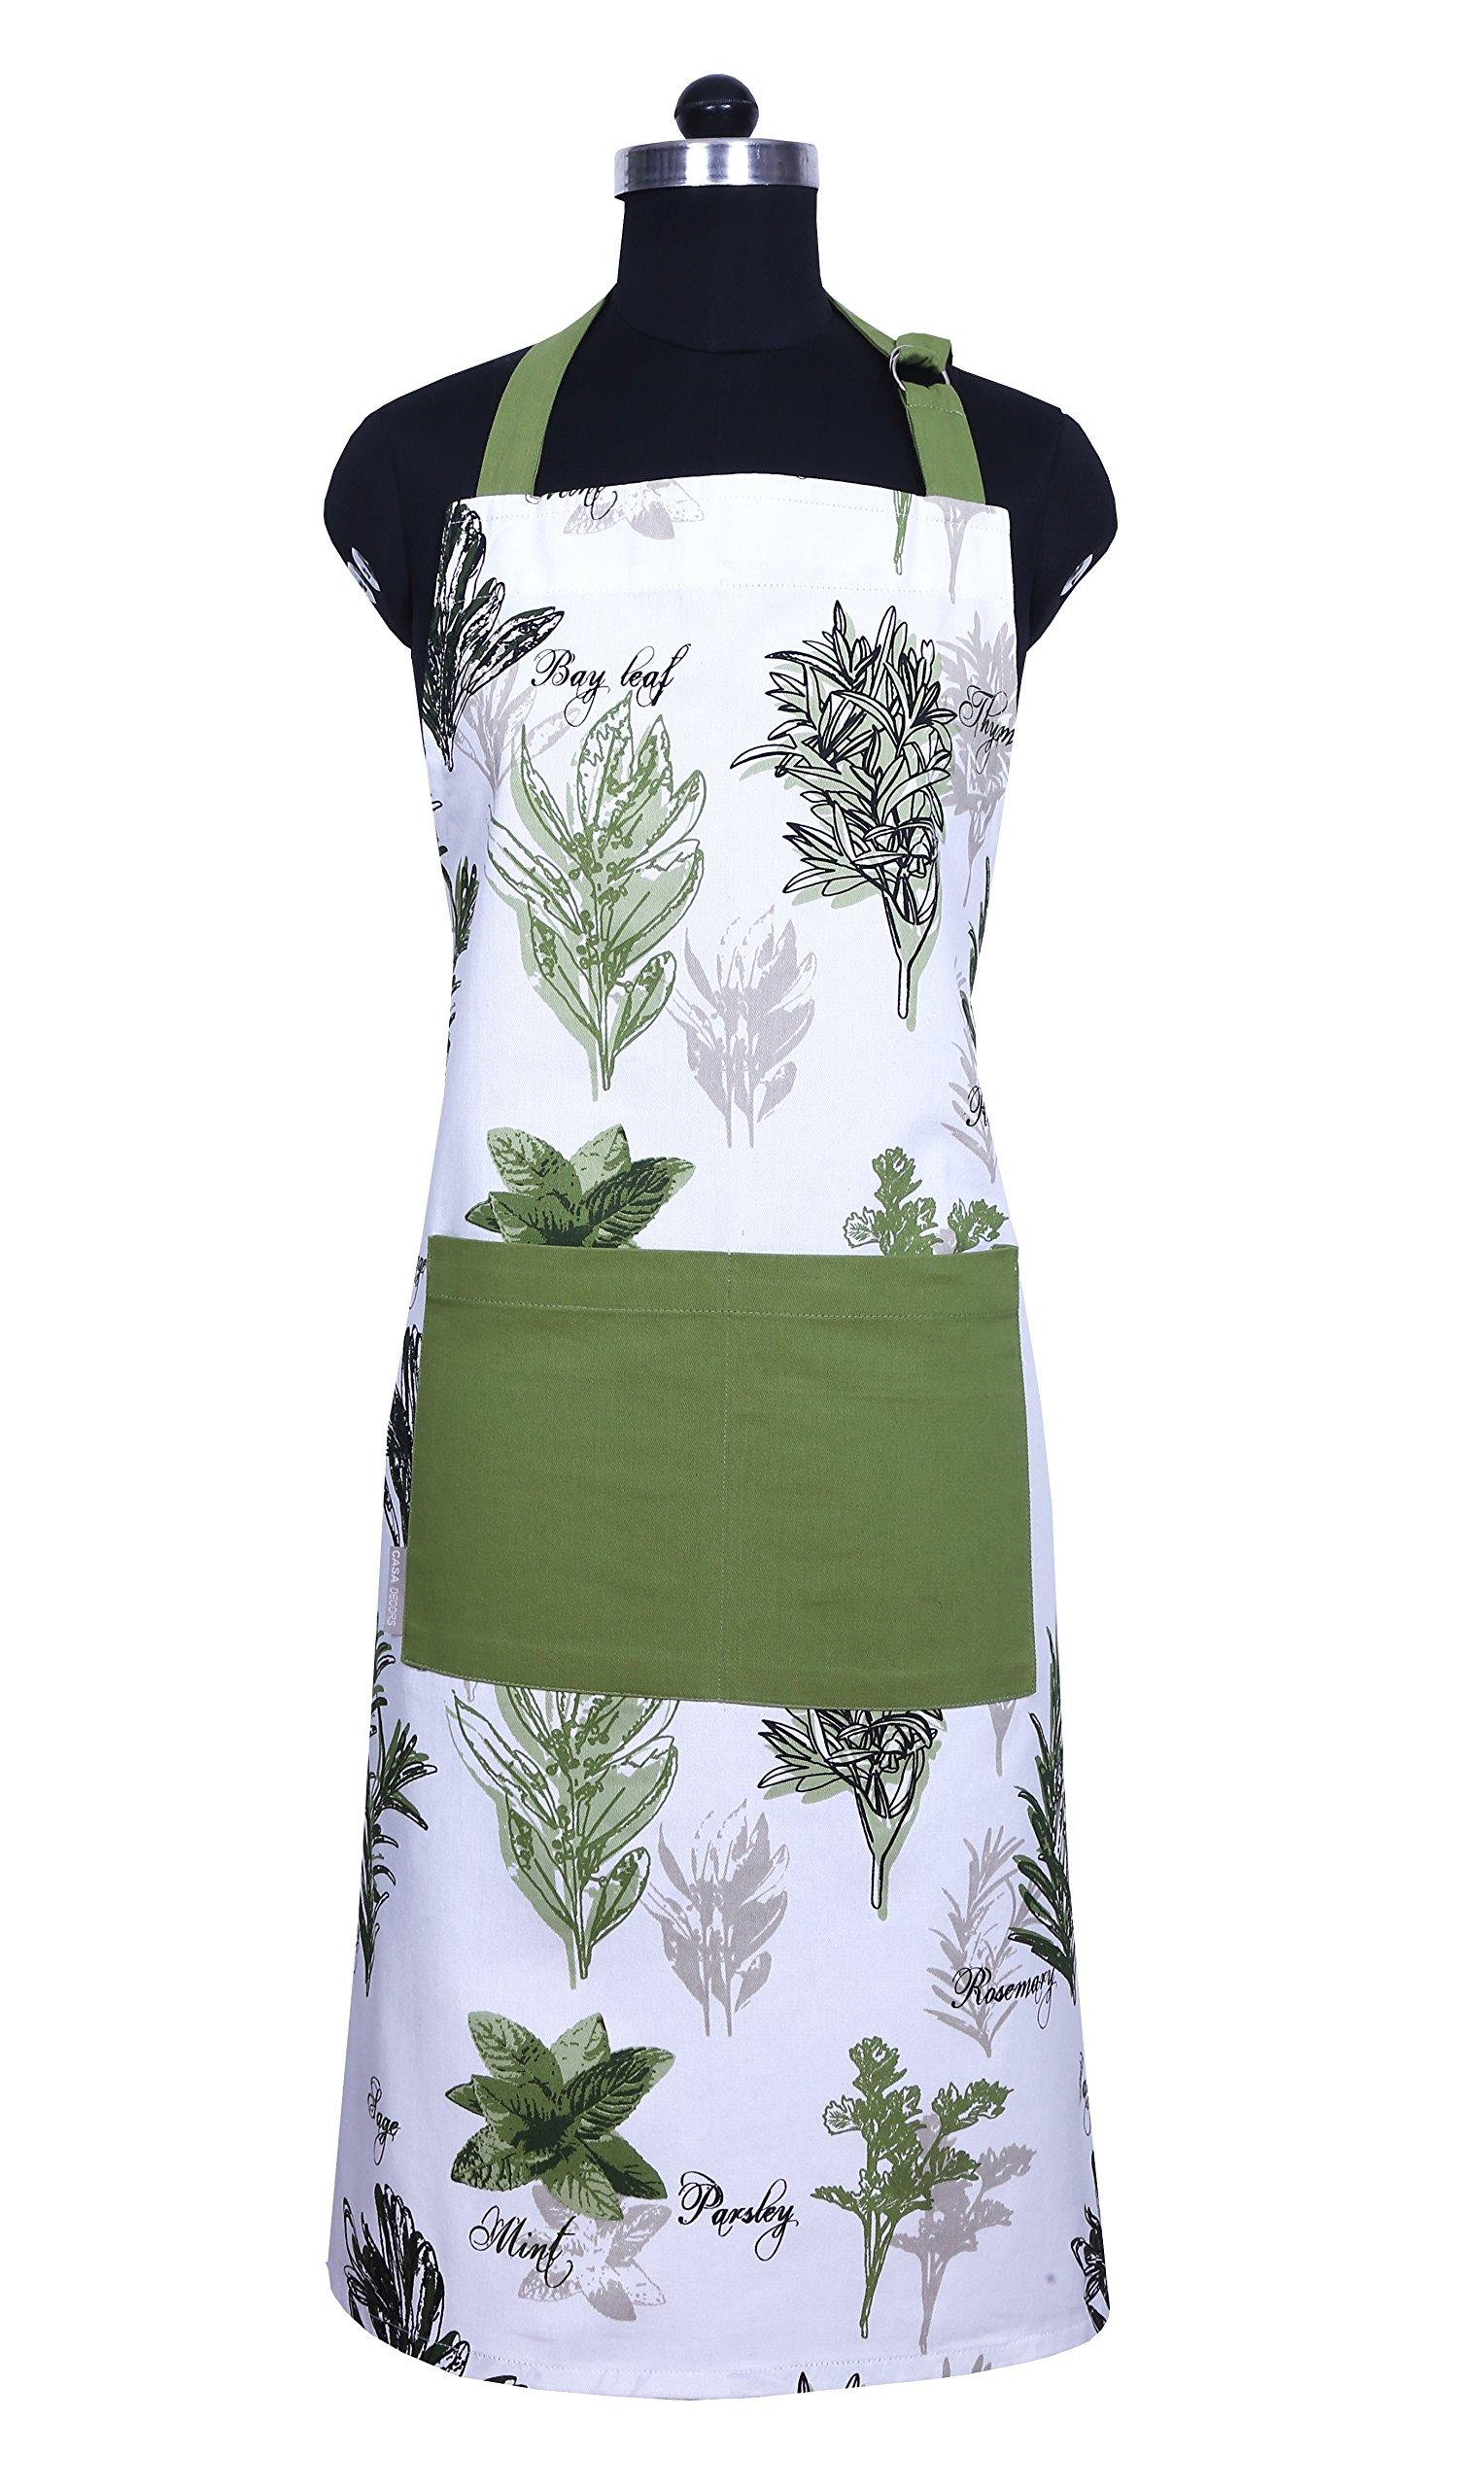 CASA DECORS Apron, Mother's Day Unique Herb Garden Design, Aprons for Women with Pockets, 100% Natural Cotton, Eco-Friendly & Safe, Adjustable Neck & Waist ties, Machine Washable